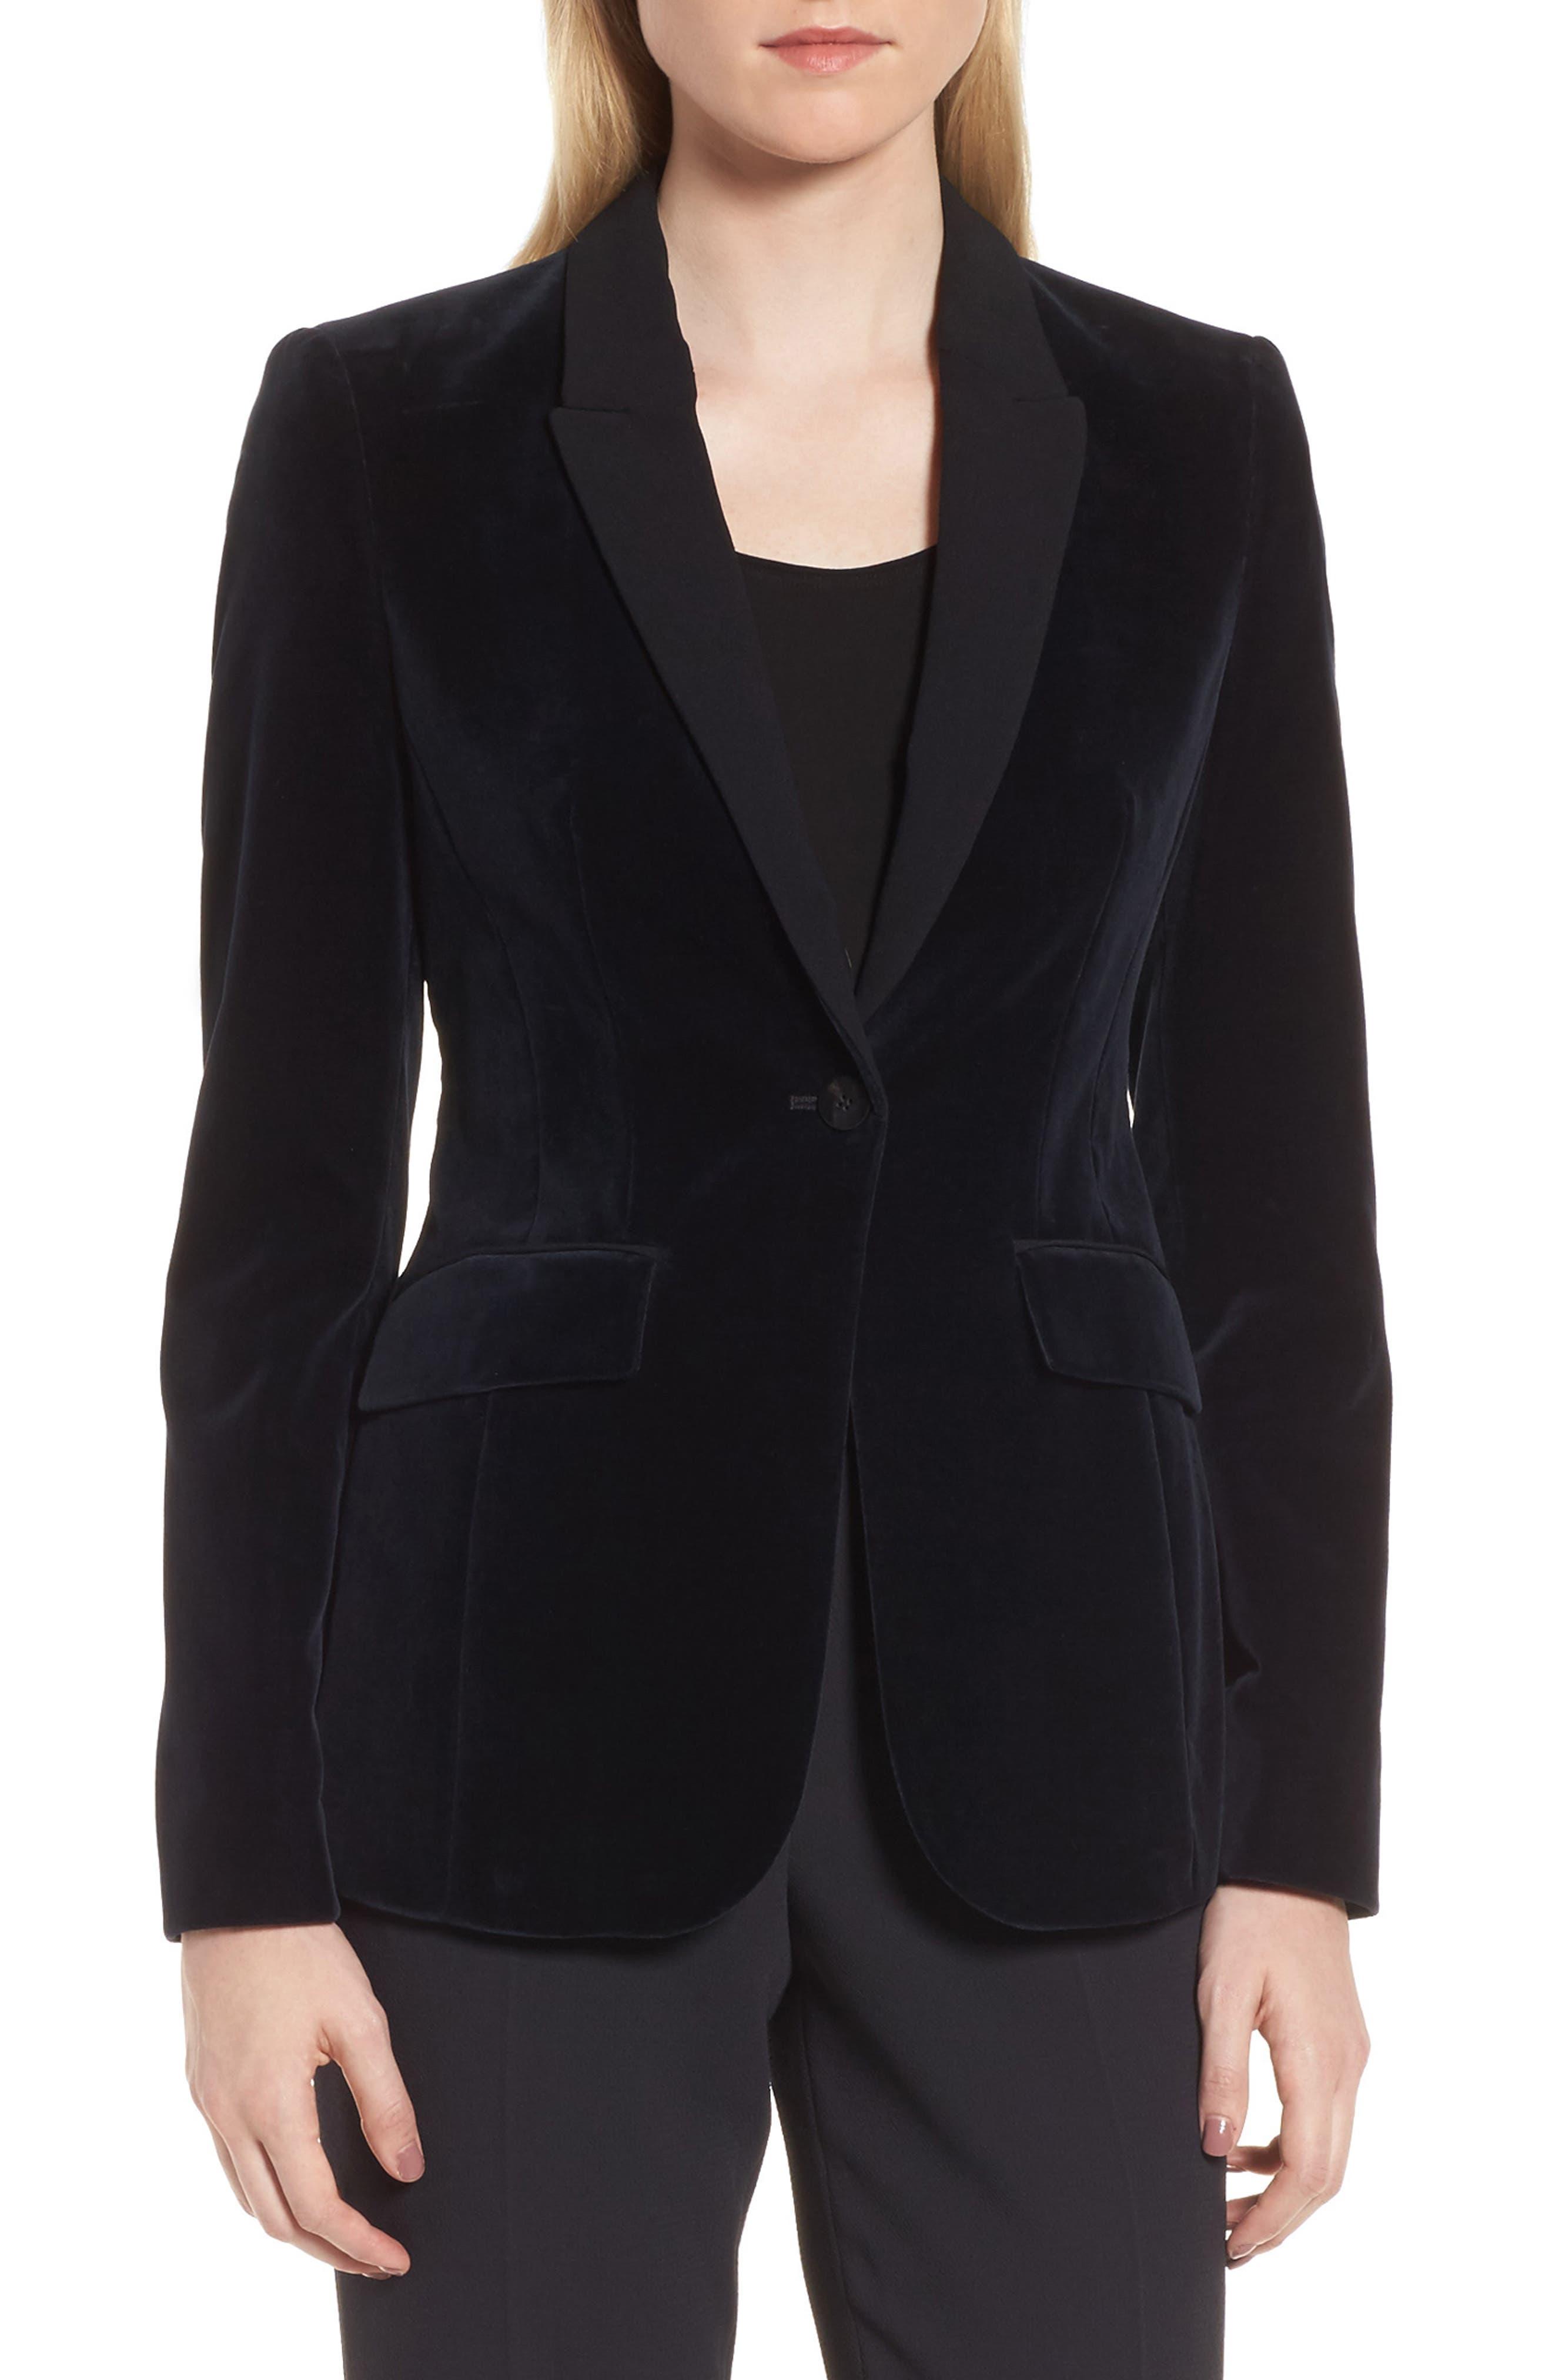 Jeronala Velvet Tuxedo Jacket,                         Main,                         color, 480